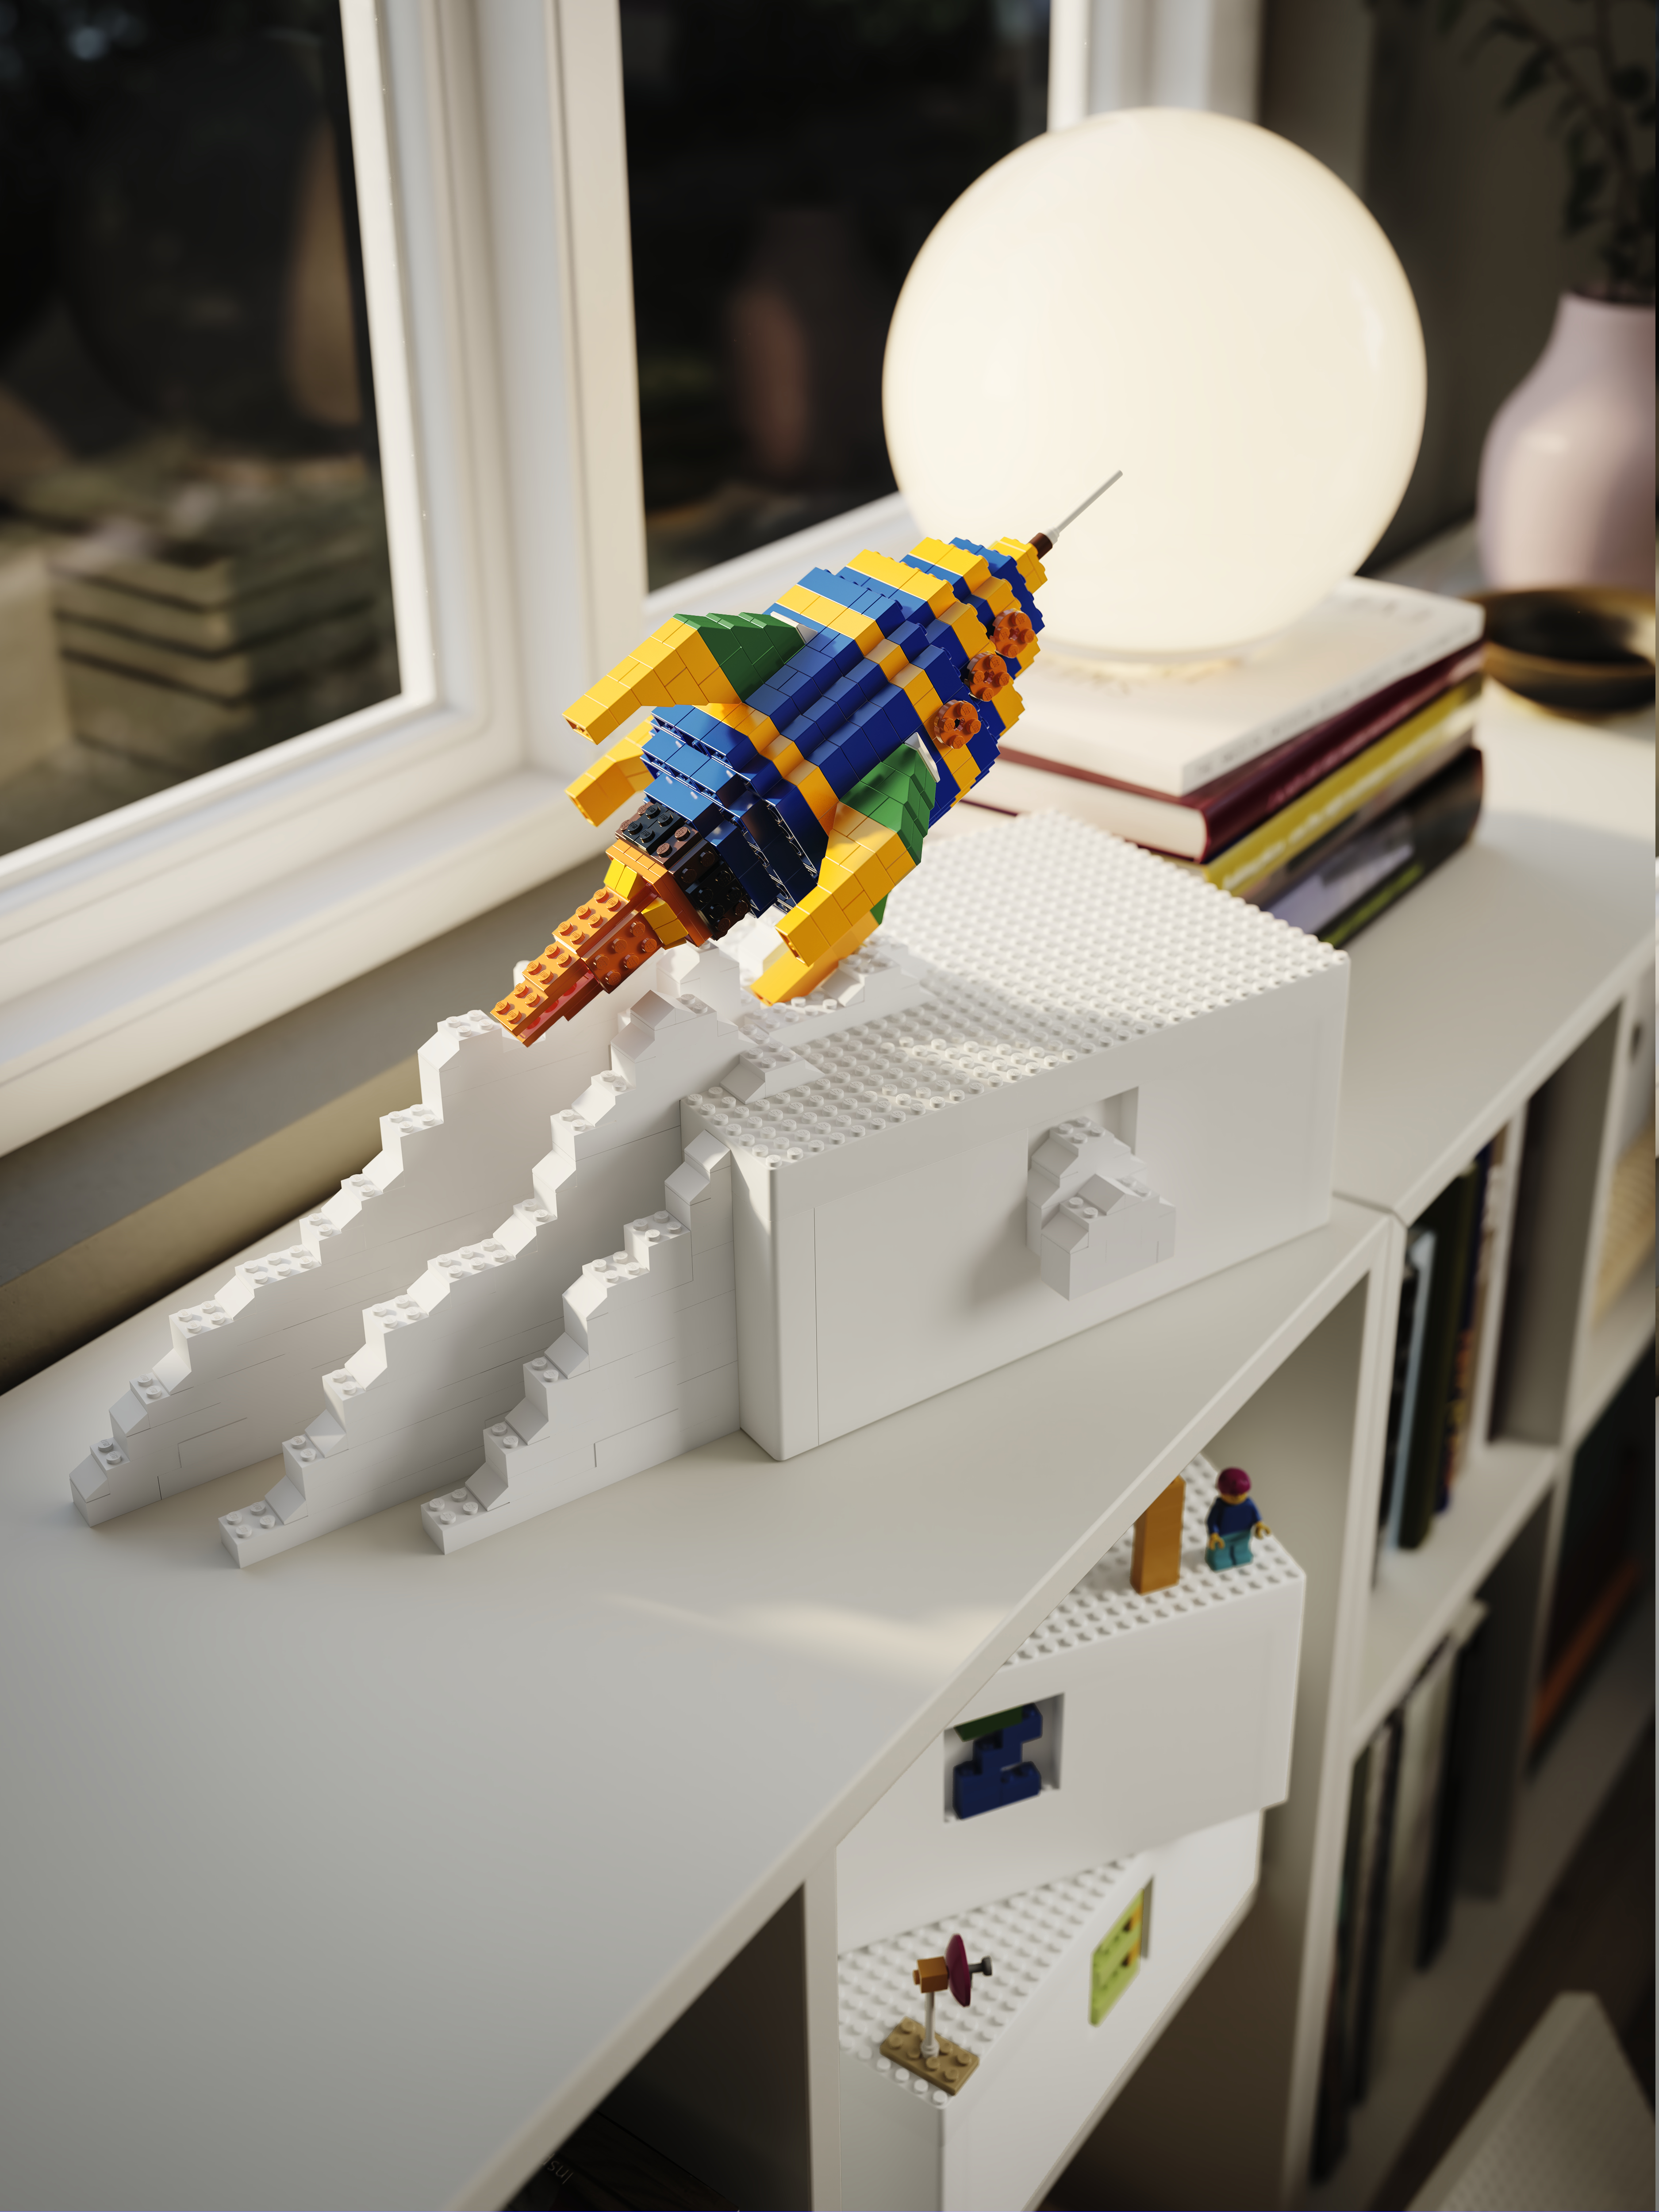 Smart Lego Storage Is Coming To Ikea, Lego Storage Ideas Ikea